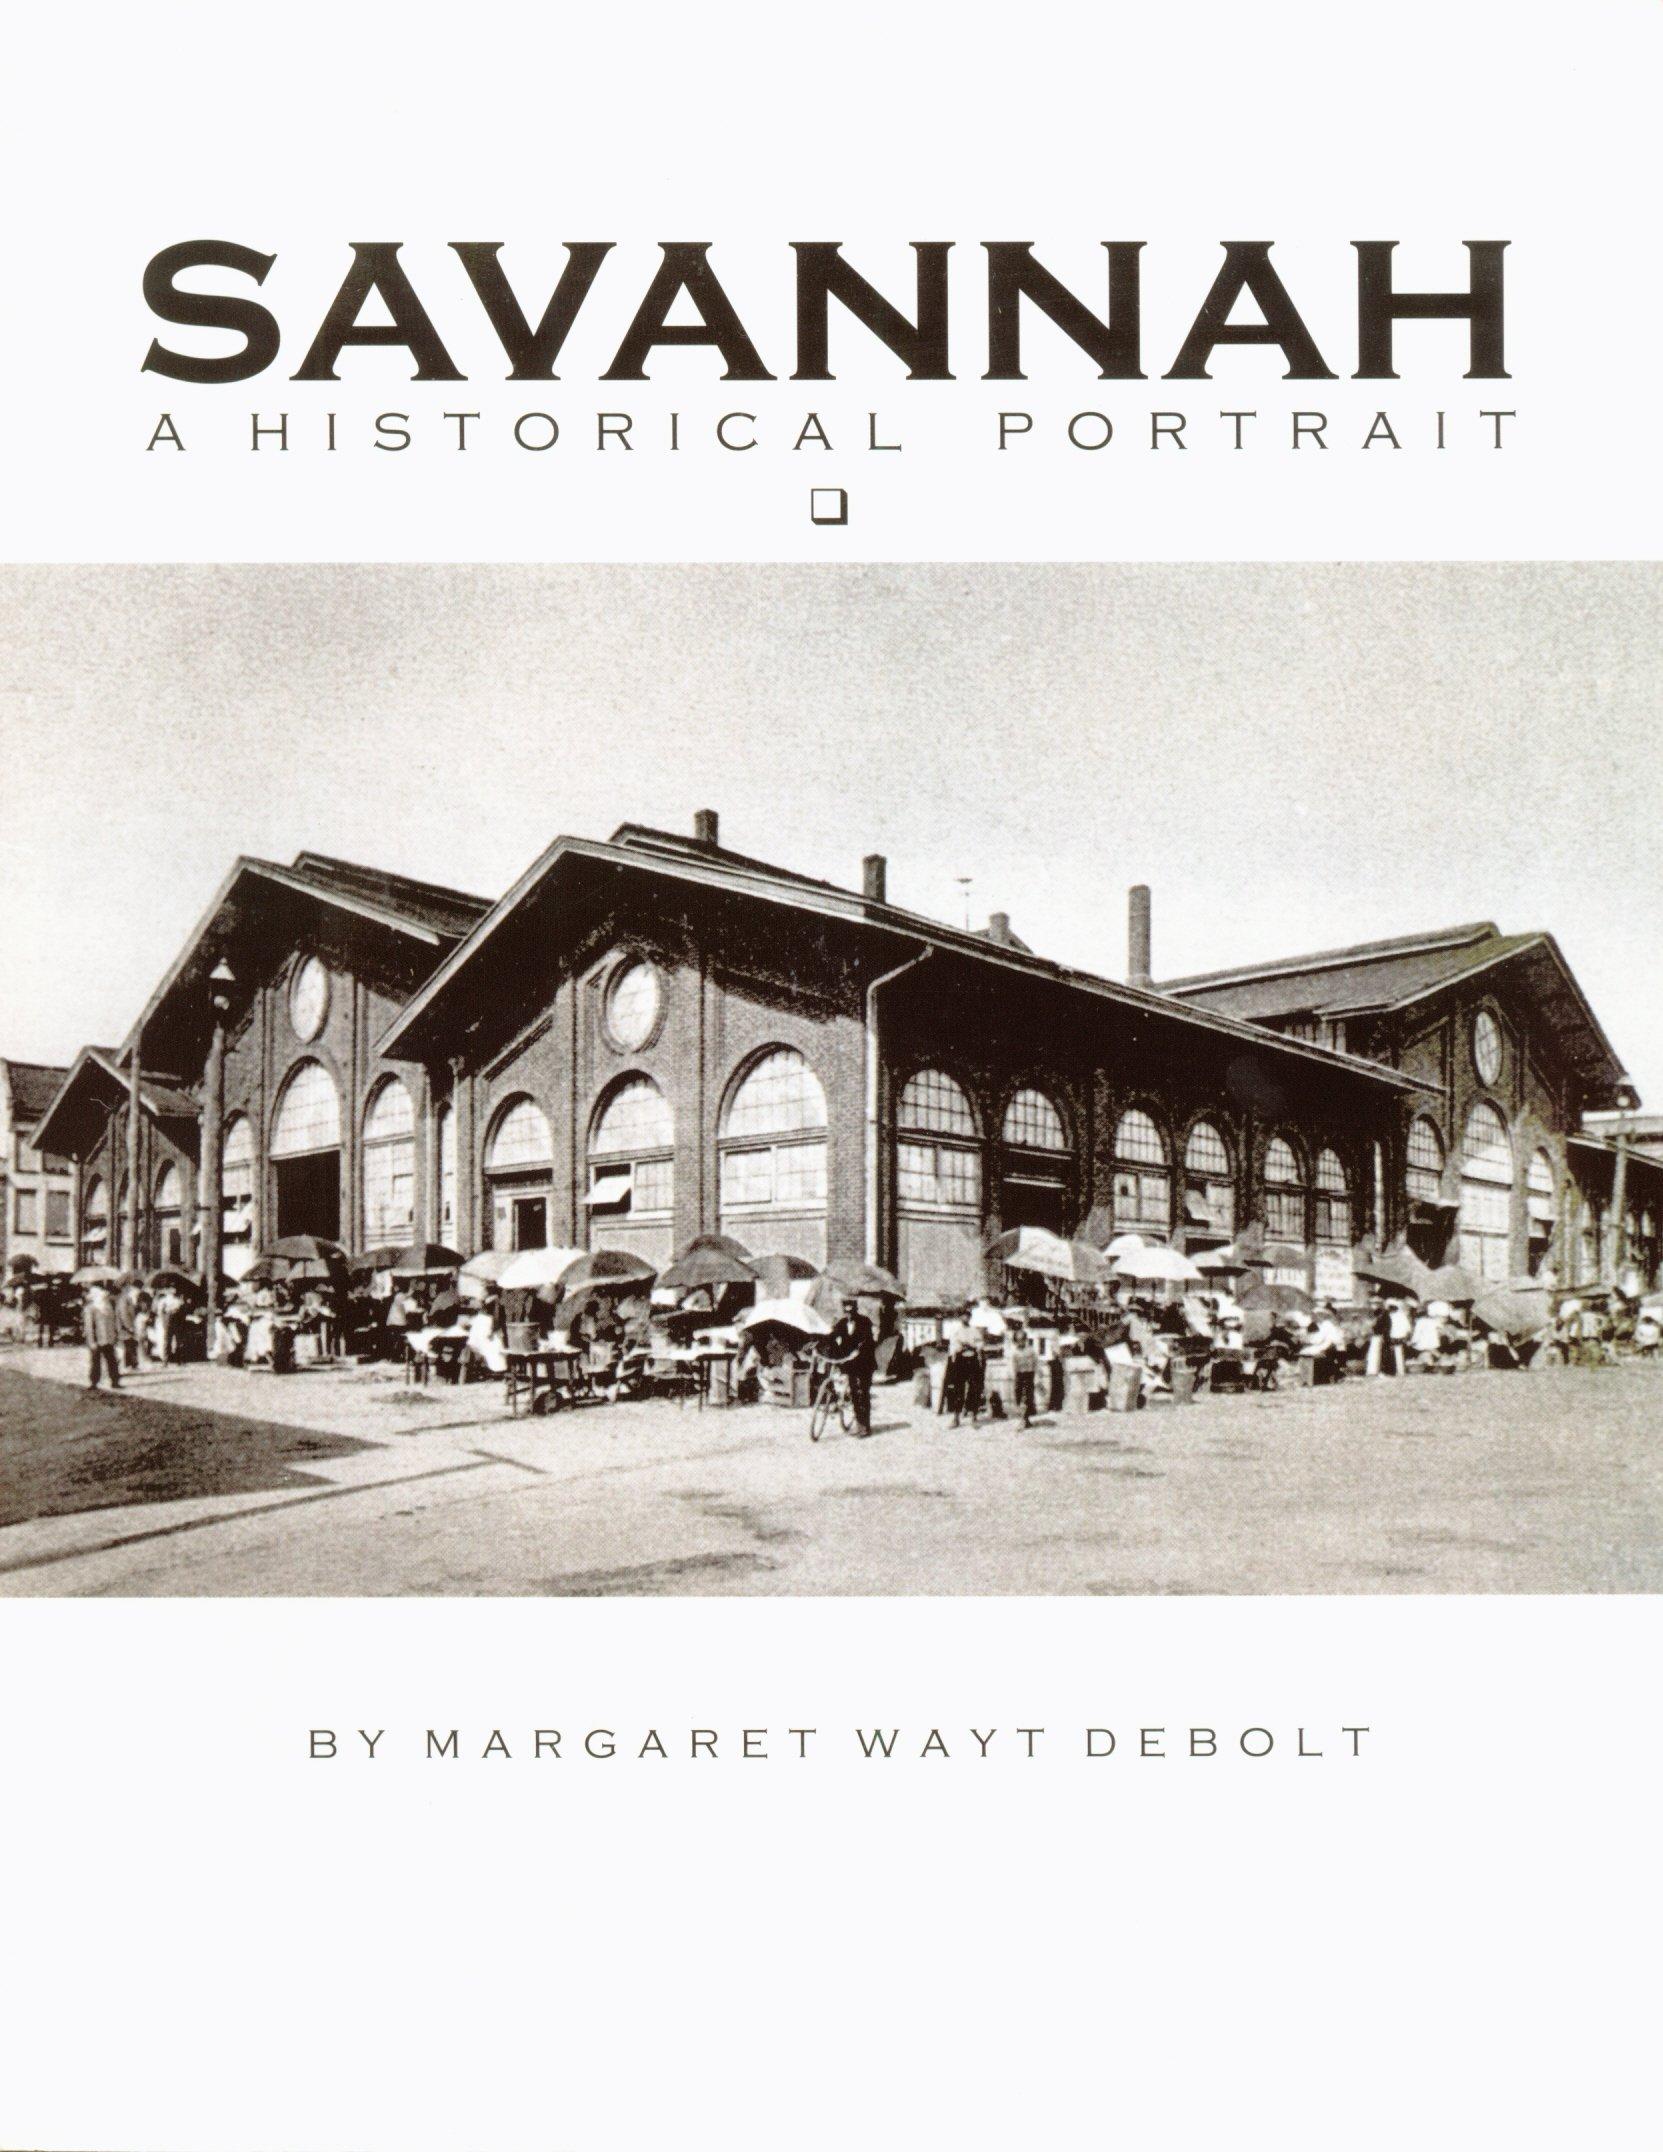 Download Savannah a Historical Portrait ebook